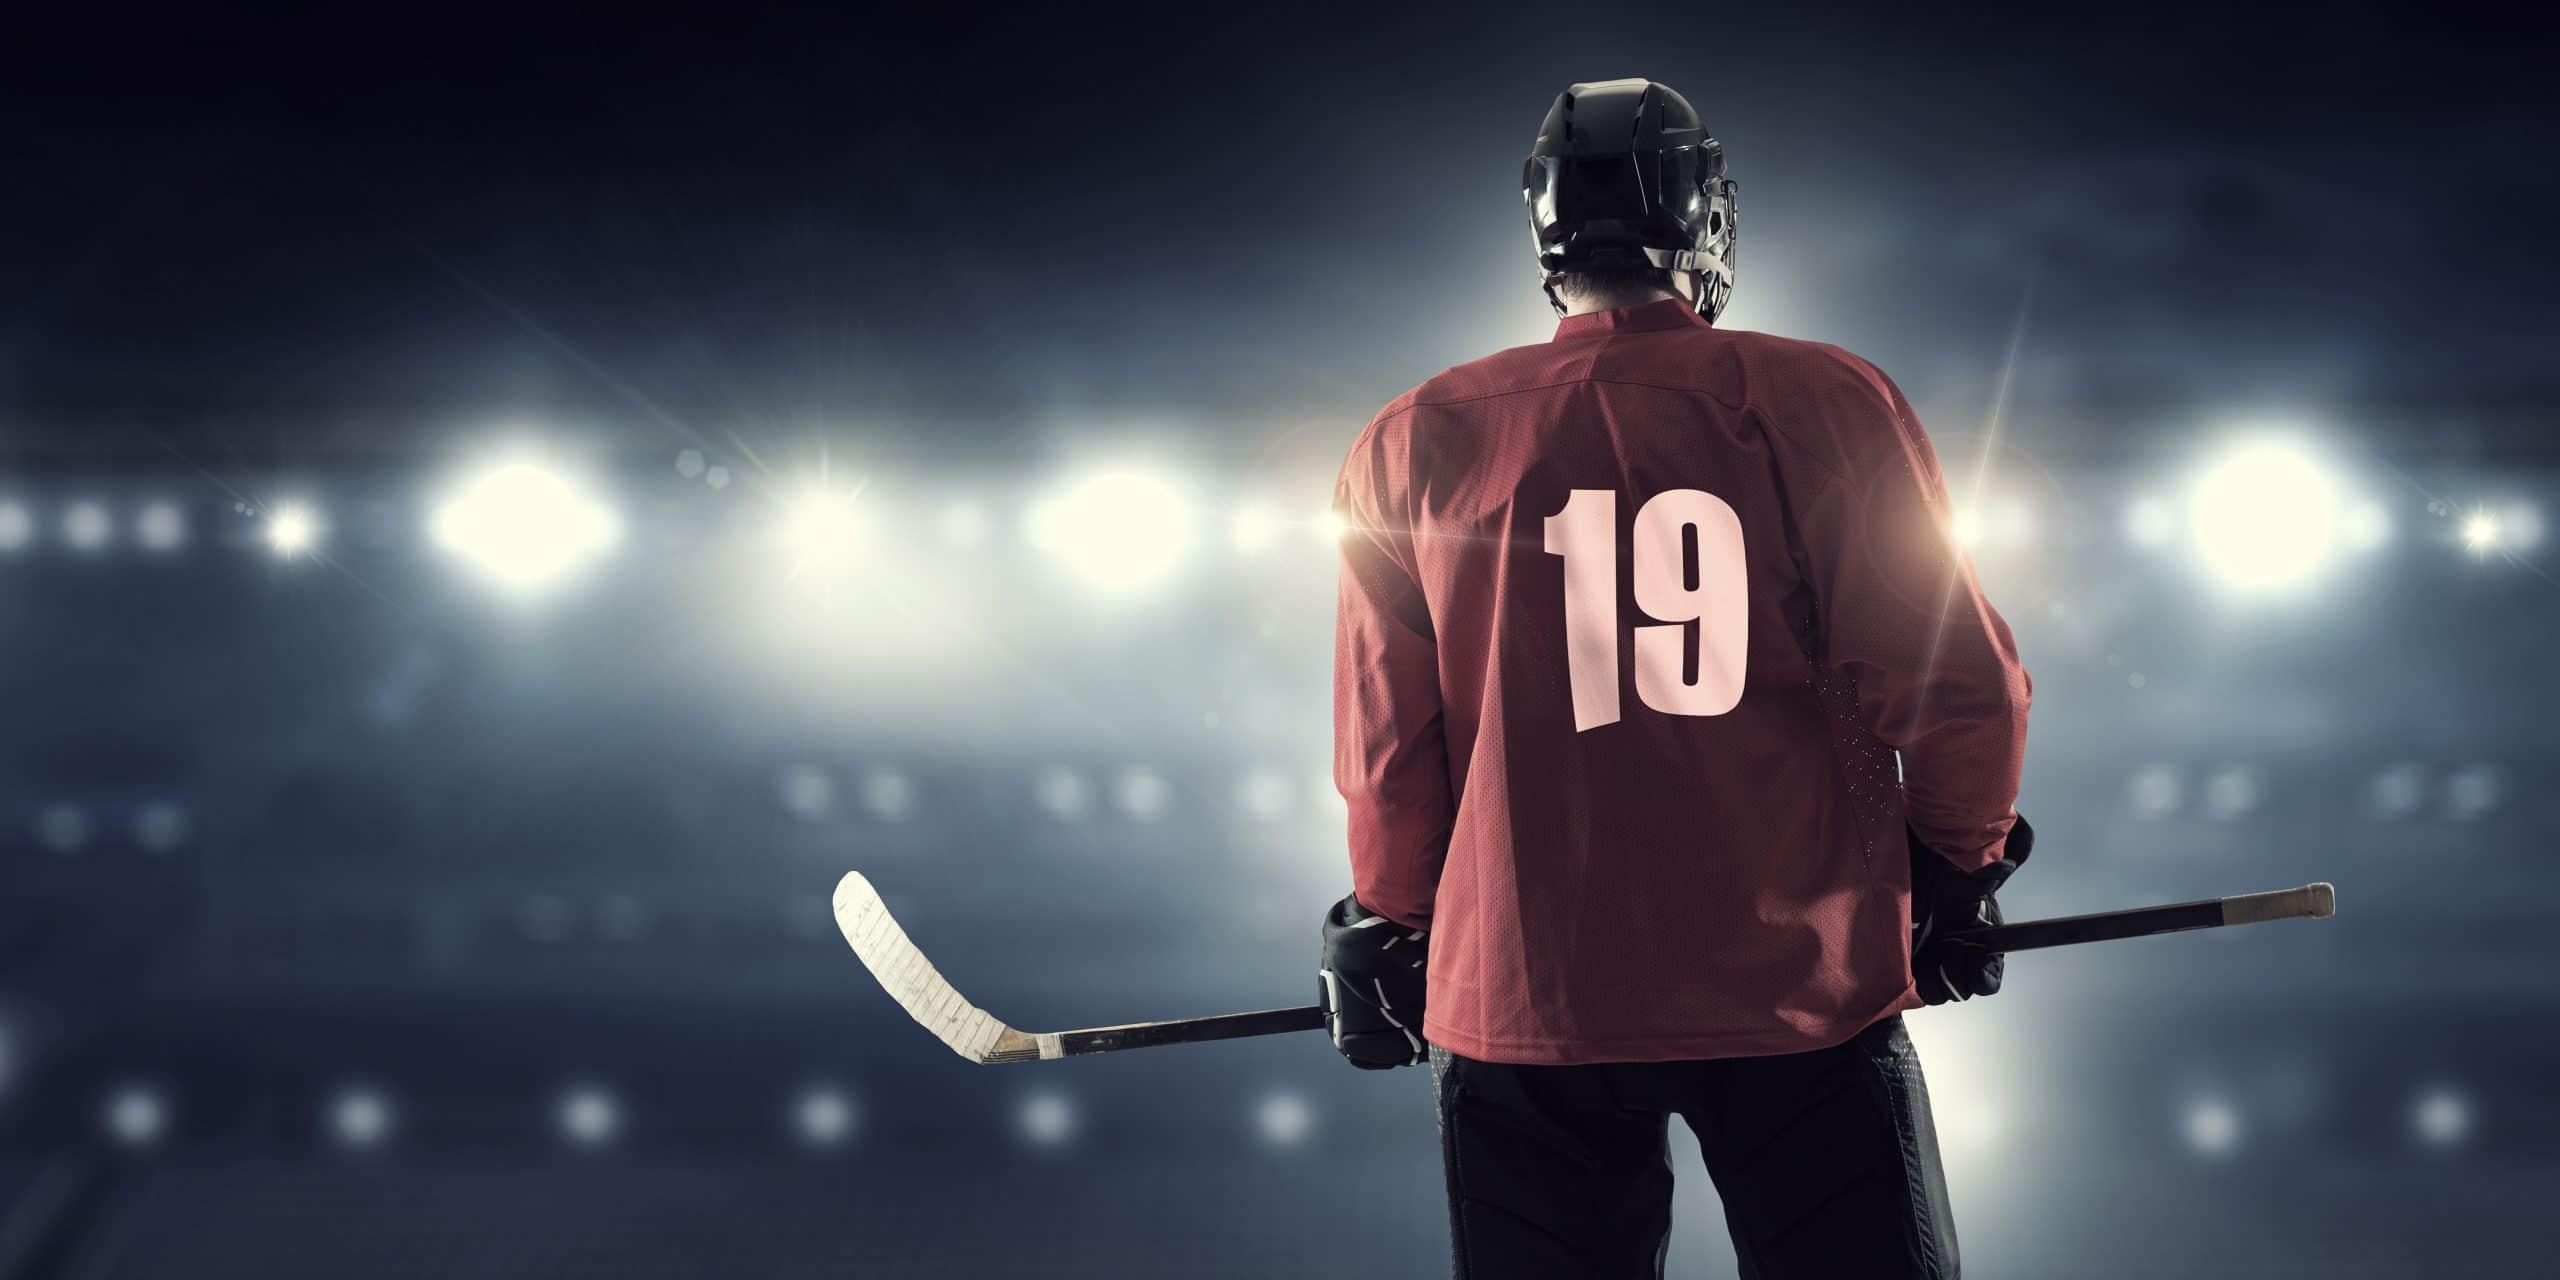 Hockey player in red uniform on ice rink in spotlight